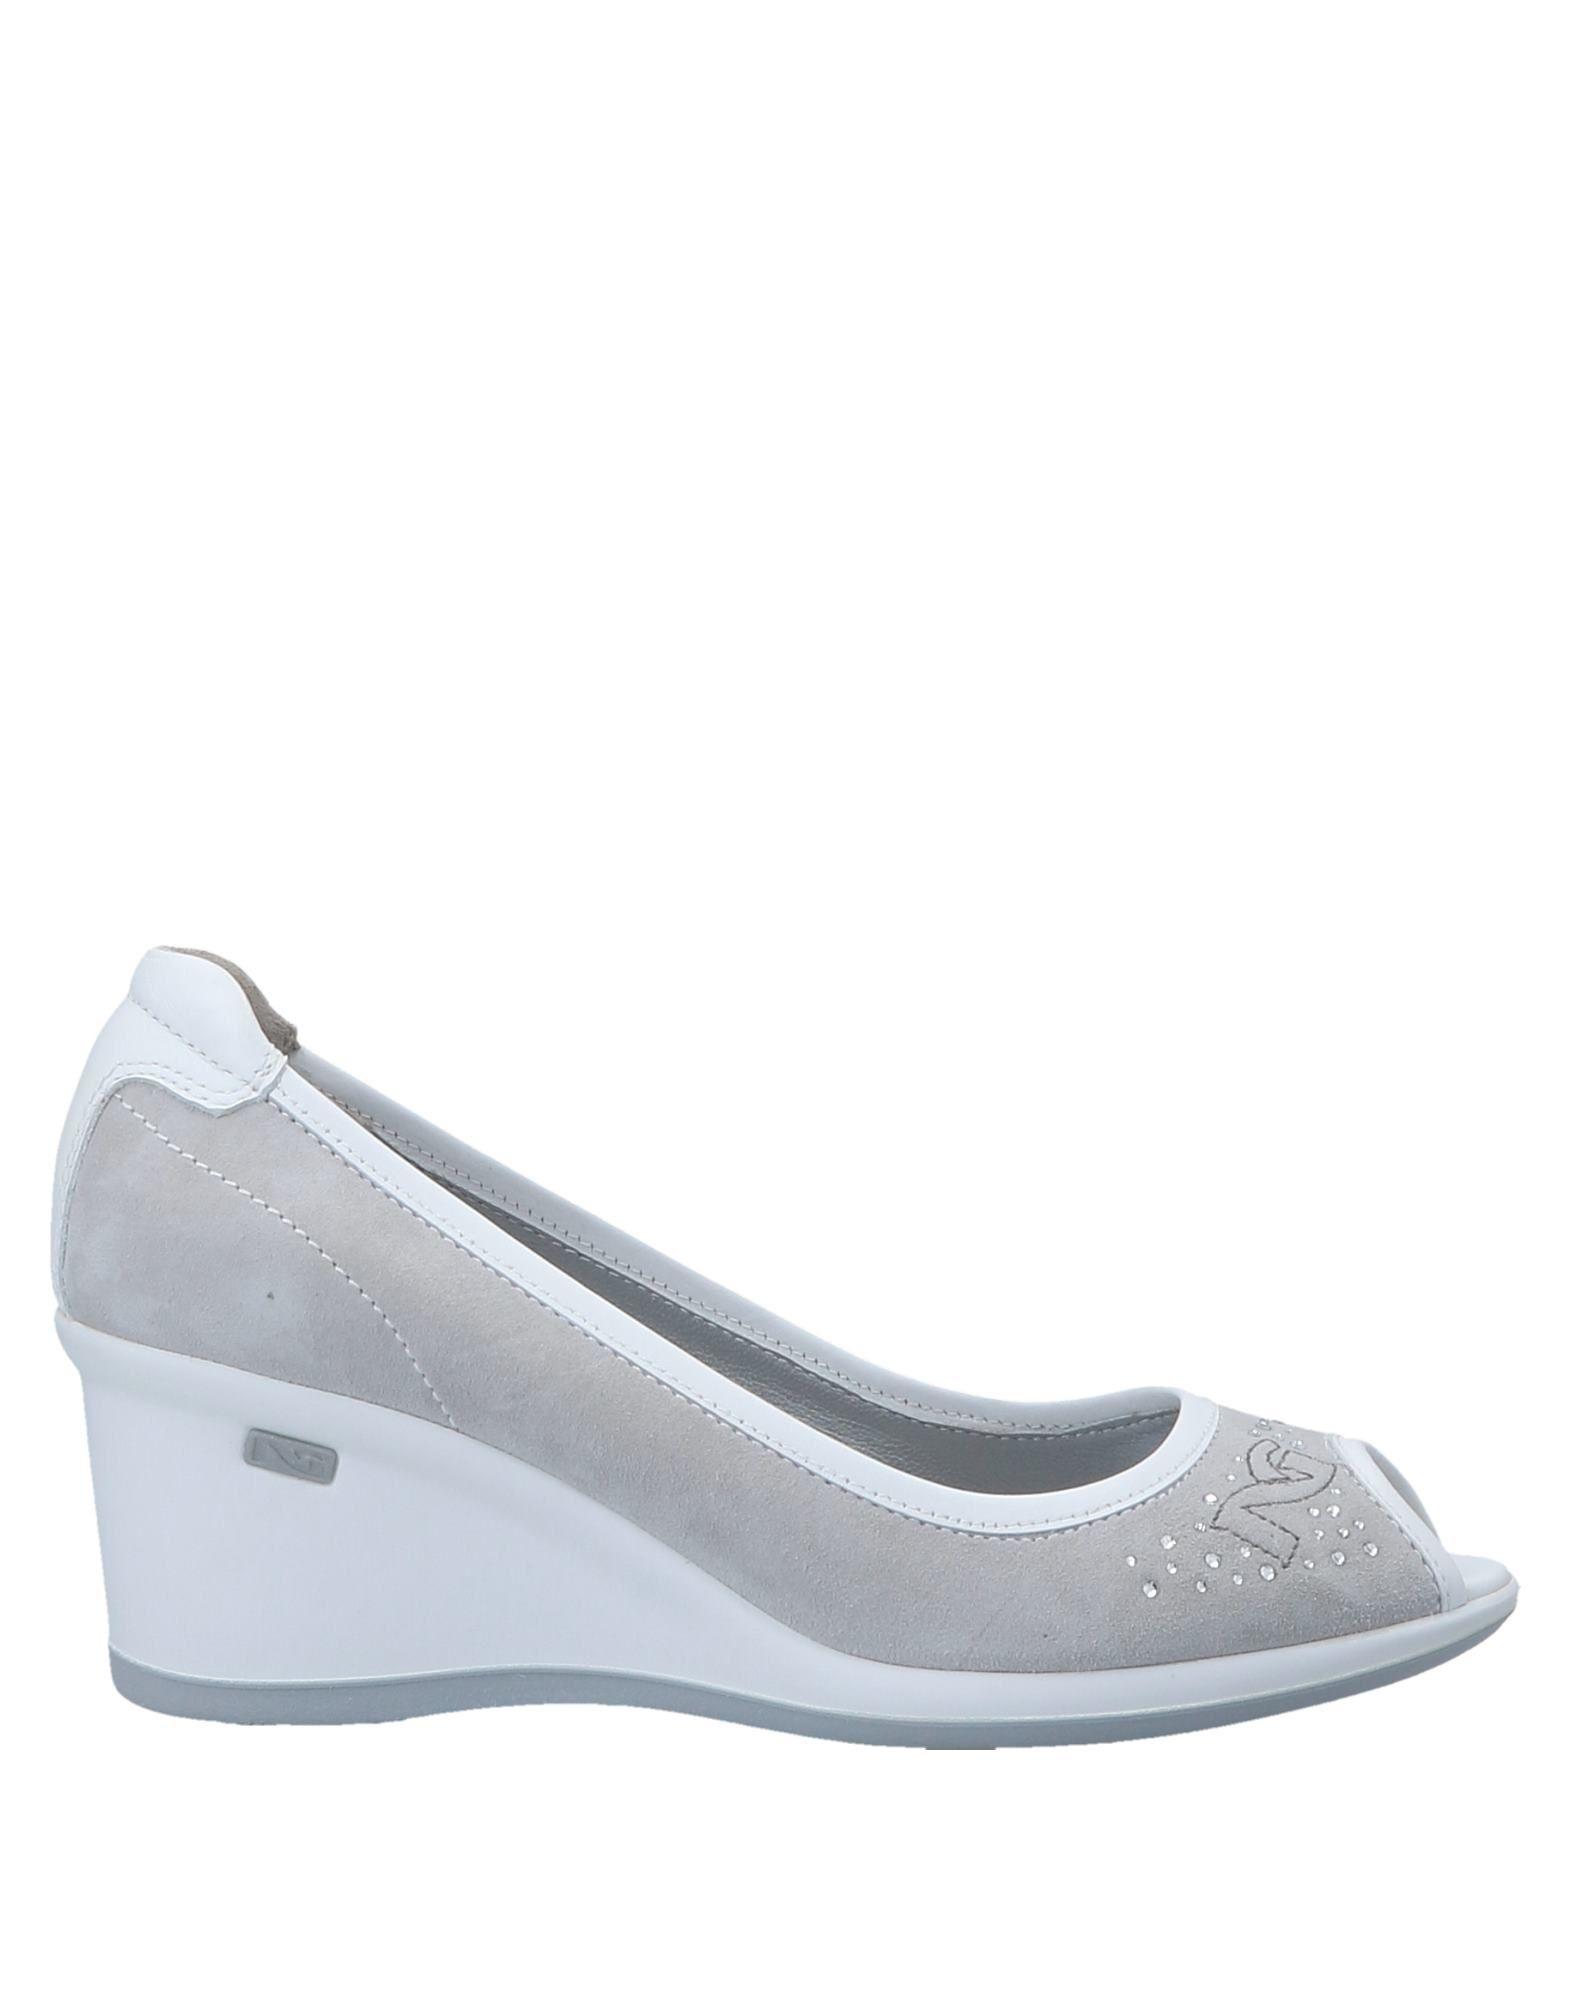 Ng Nero Giardini Pumps beliebte Damen  44966068NN Gute Qualität beliebte Pumps Schuhe 249c2f